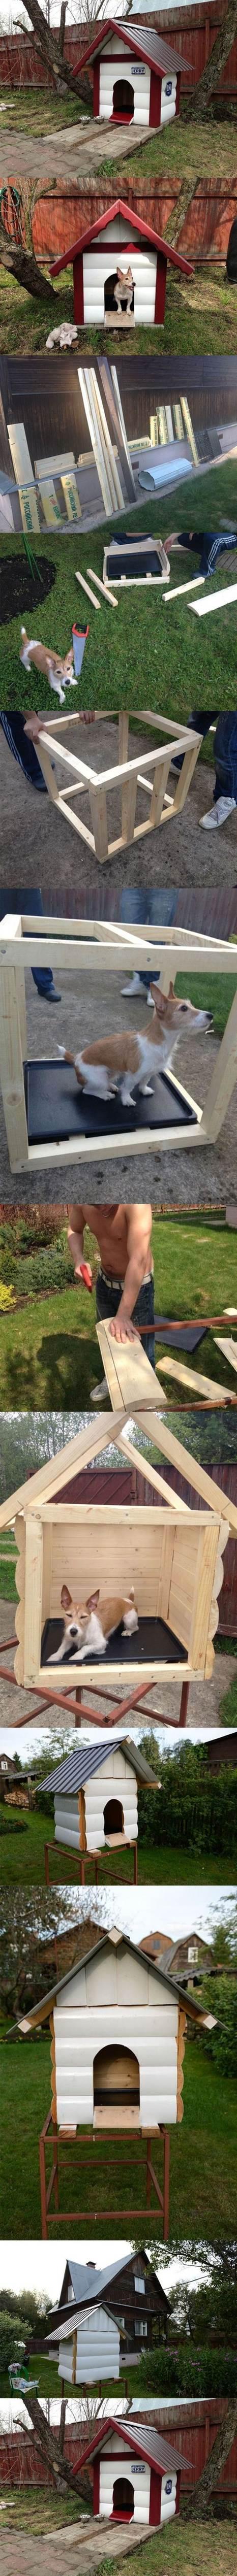 DIY Outdoor Dog House 2